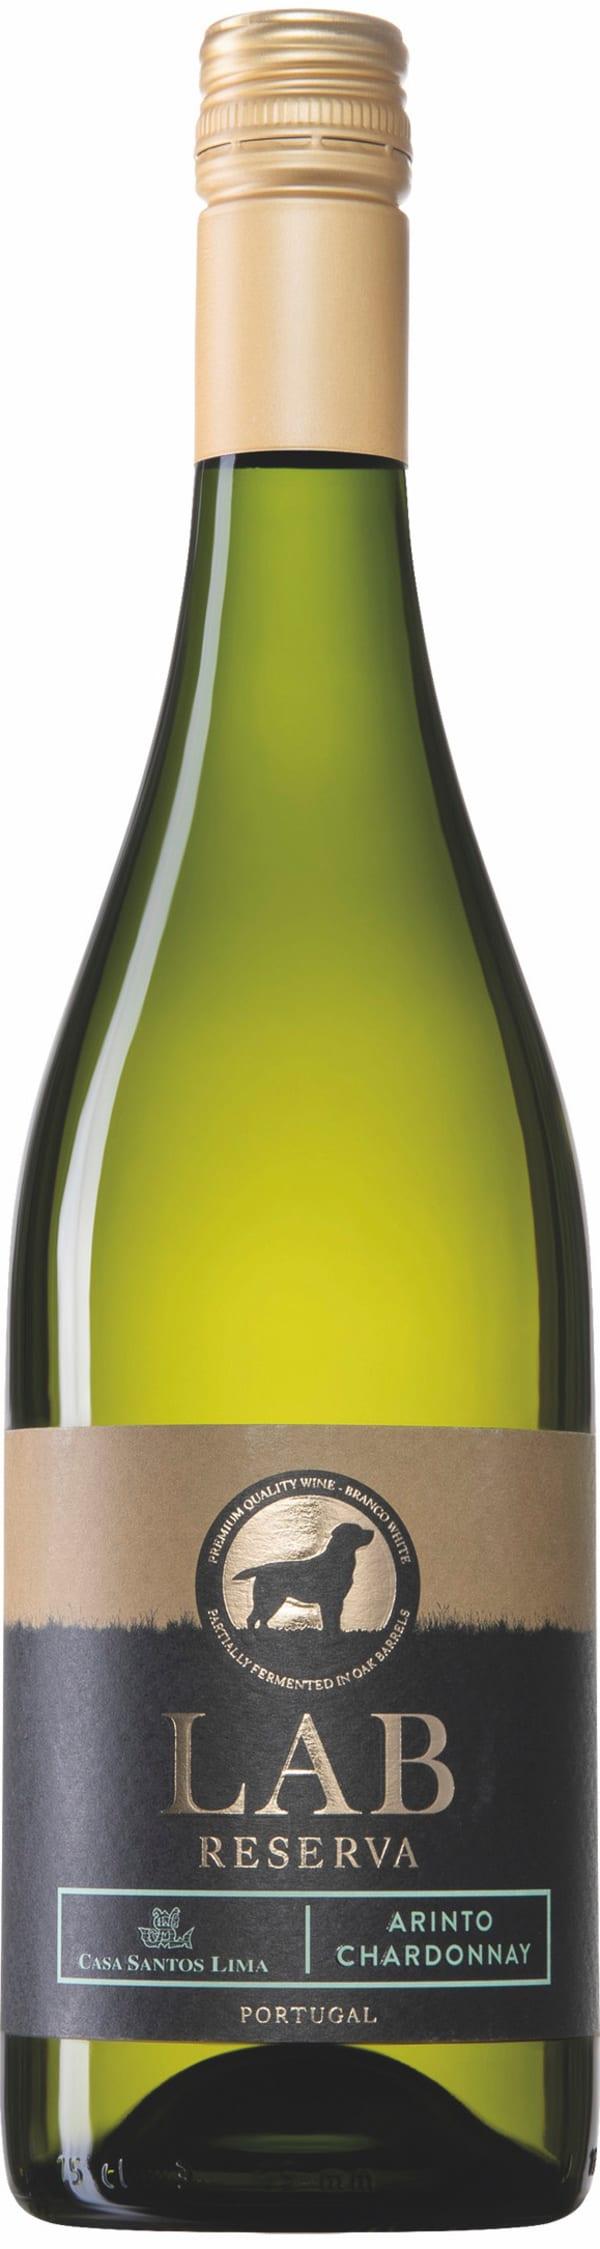 LAB Reserva Arinto Chardonnay 2018